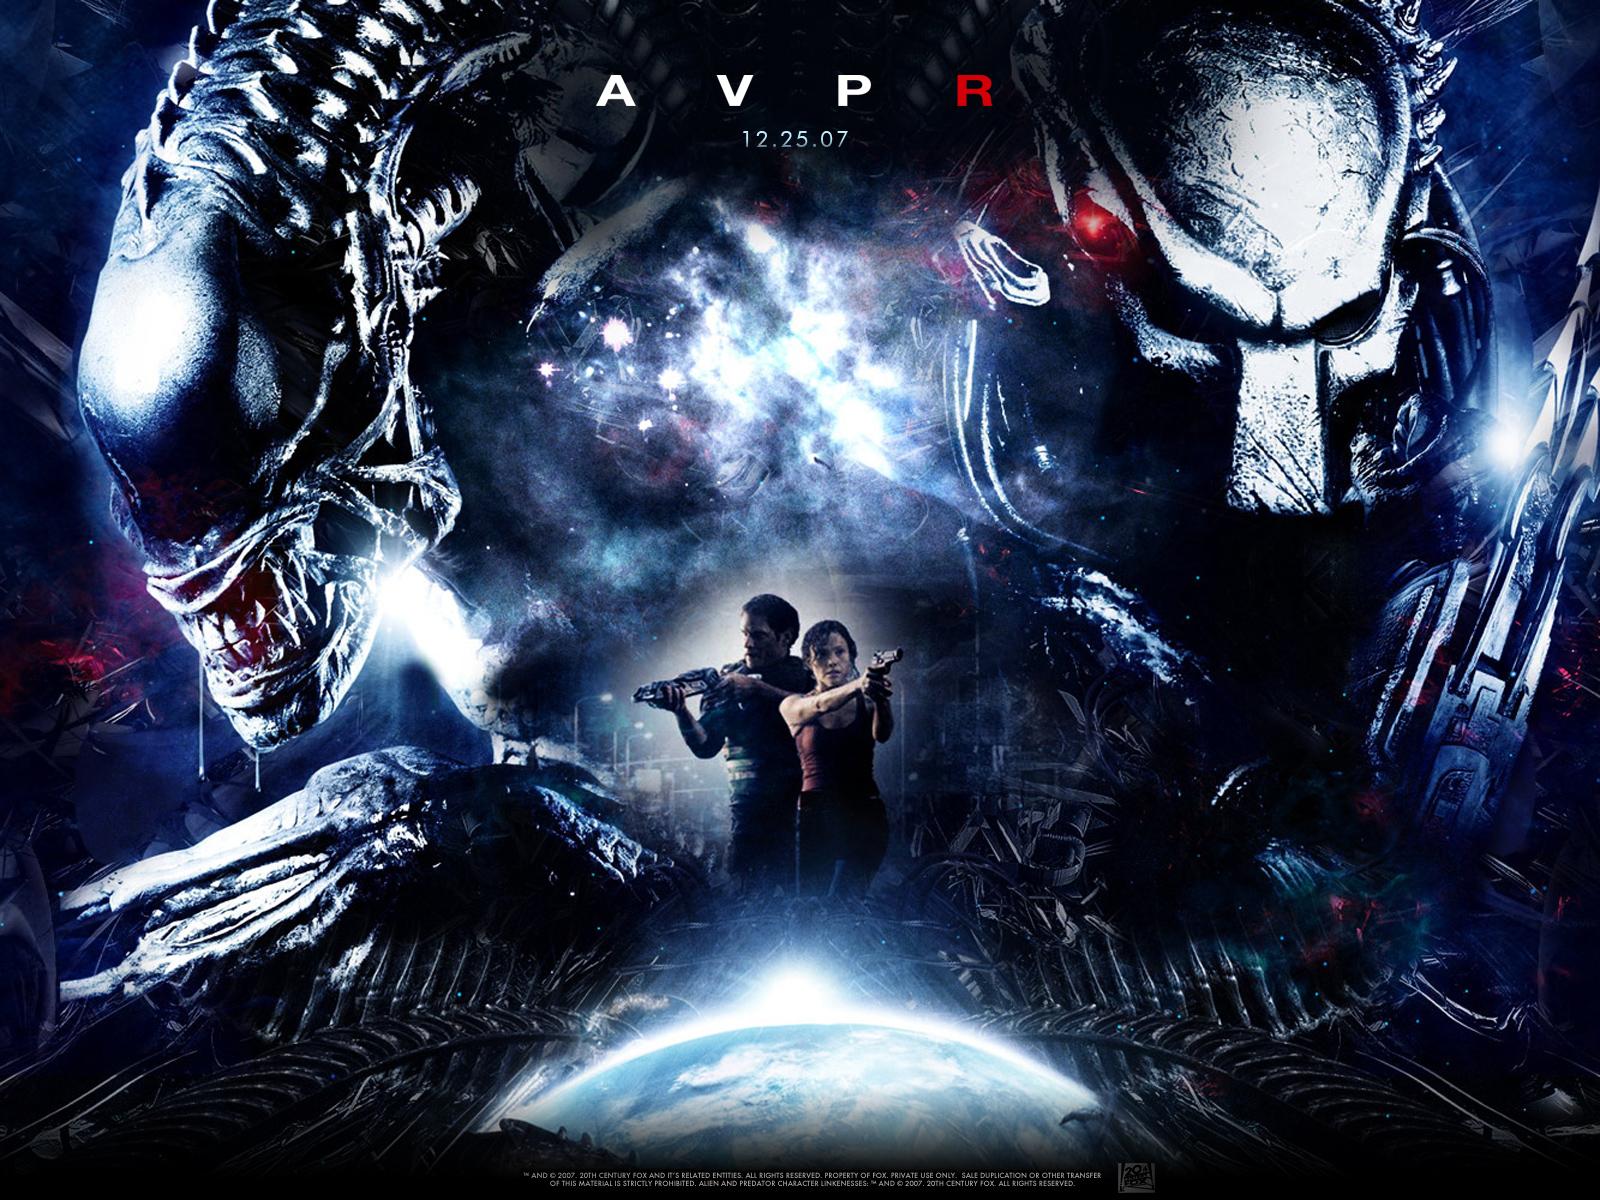 AvP Unknown - Your resource for Aliens vs. Predator games.